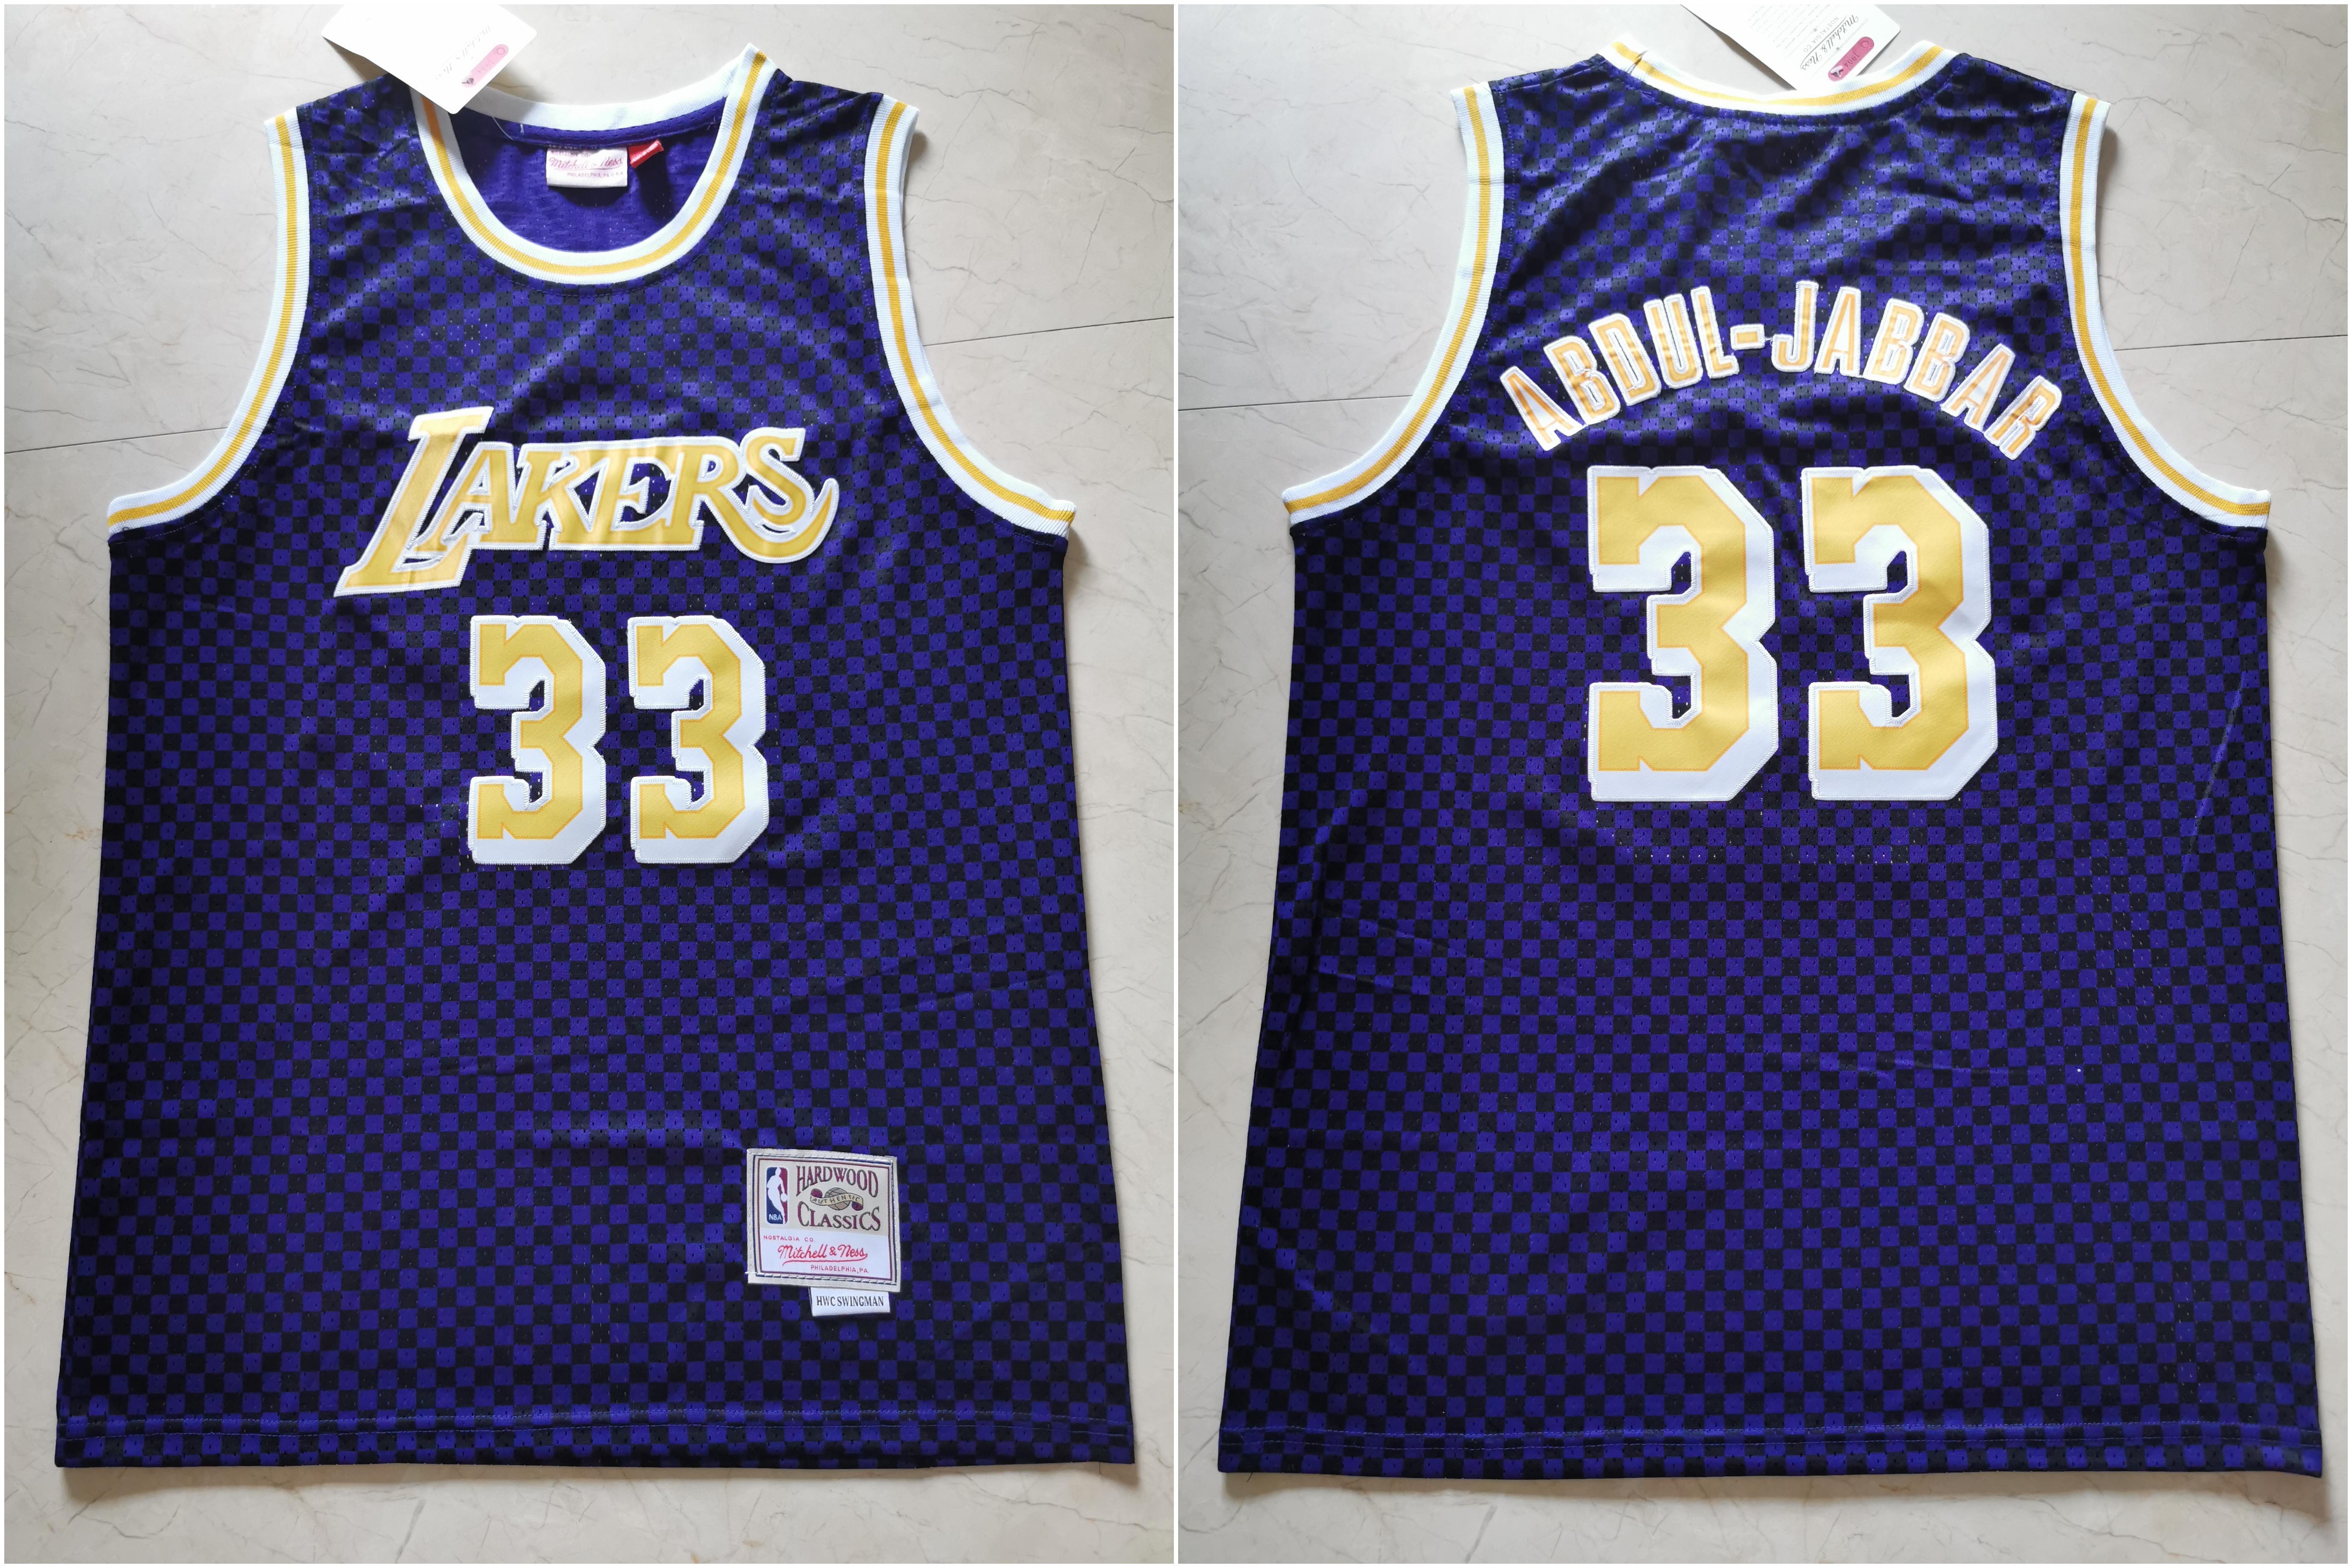 Lakers 33 Kareem Abdul-Jabbar Purple Hardwood Classics Jersey